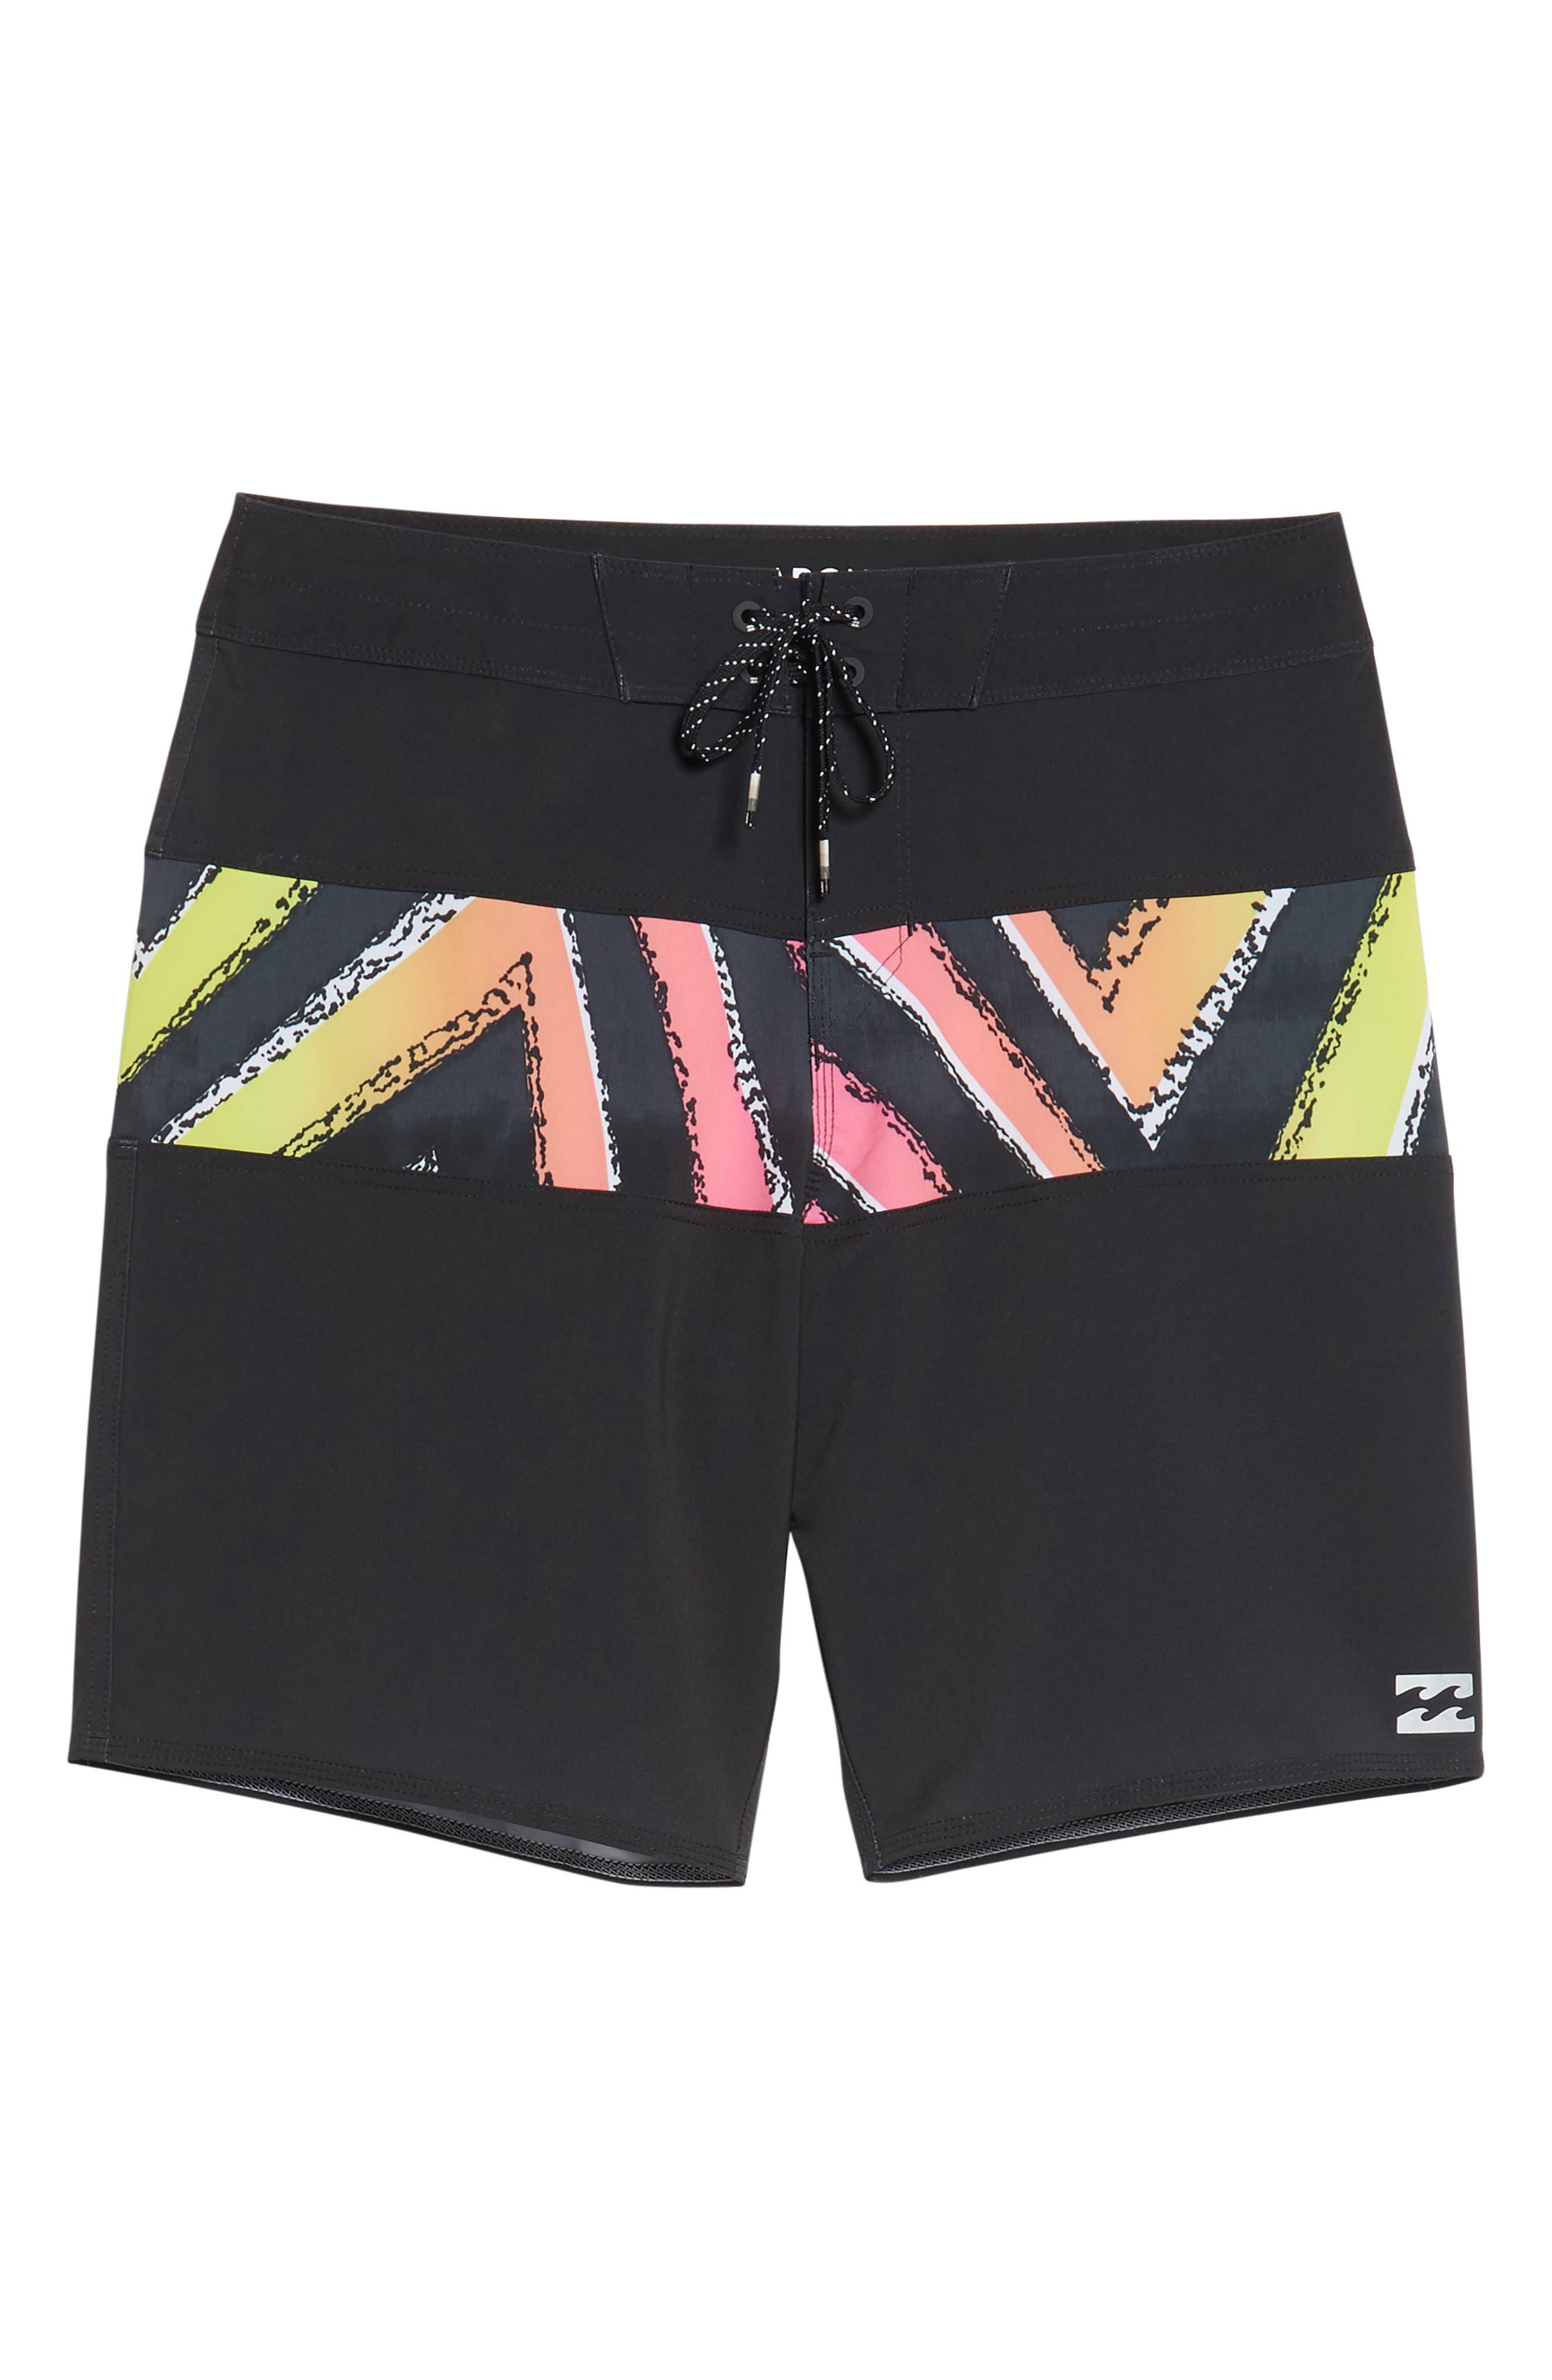 Tribong X Board Shorts,                             Alternate thumbnail 6, color,                             001